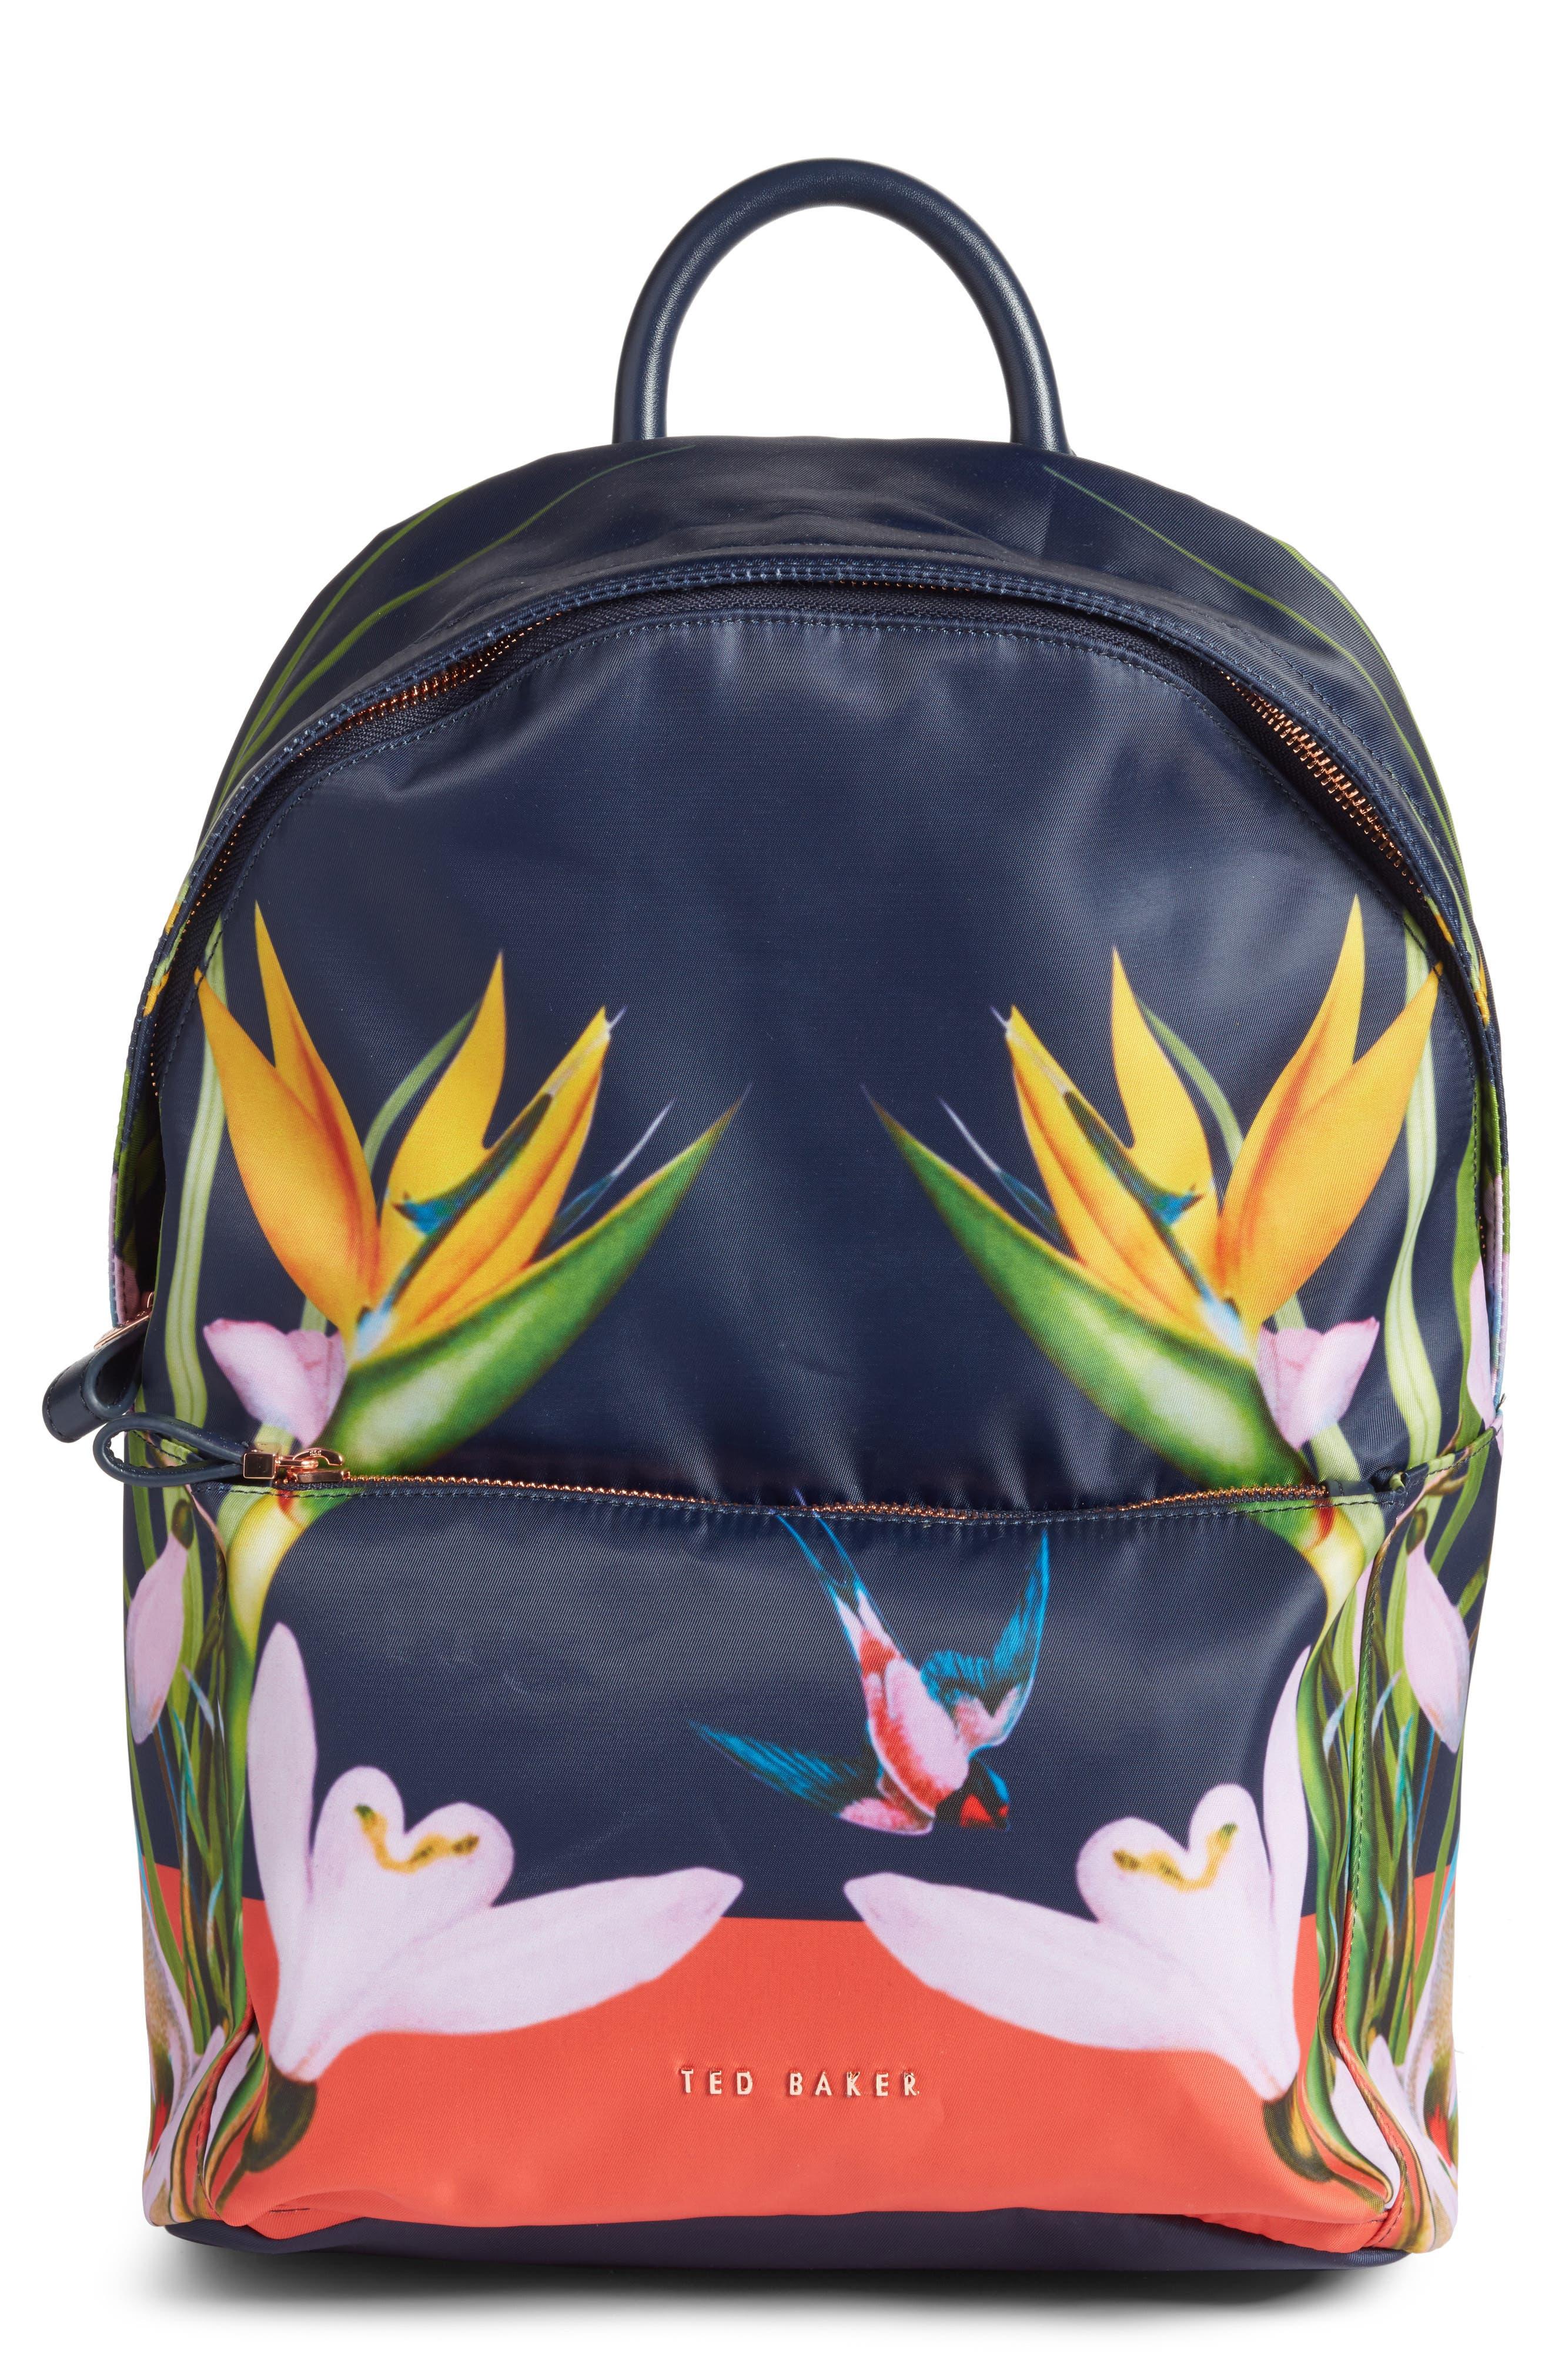 Ted Baker London Tropical Oasis Backpack